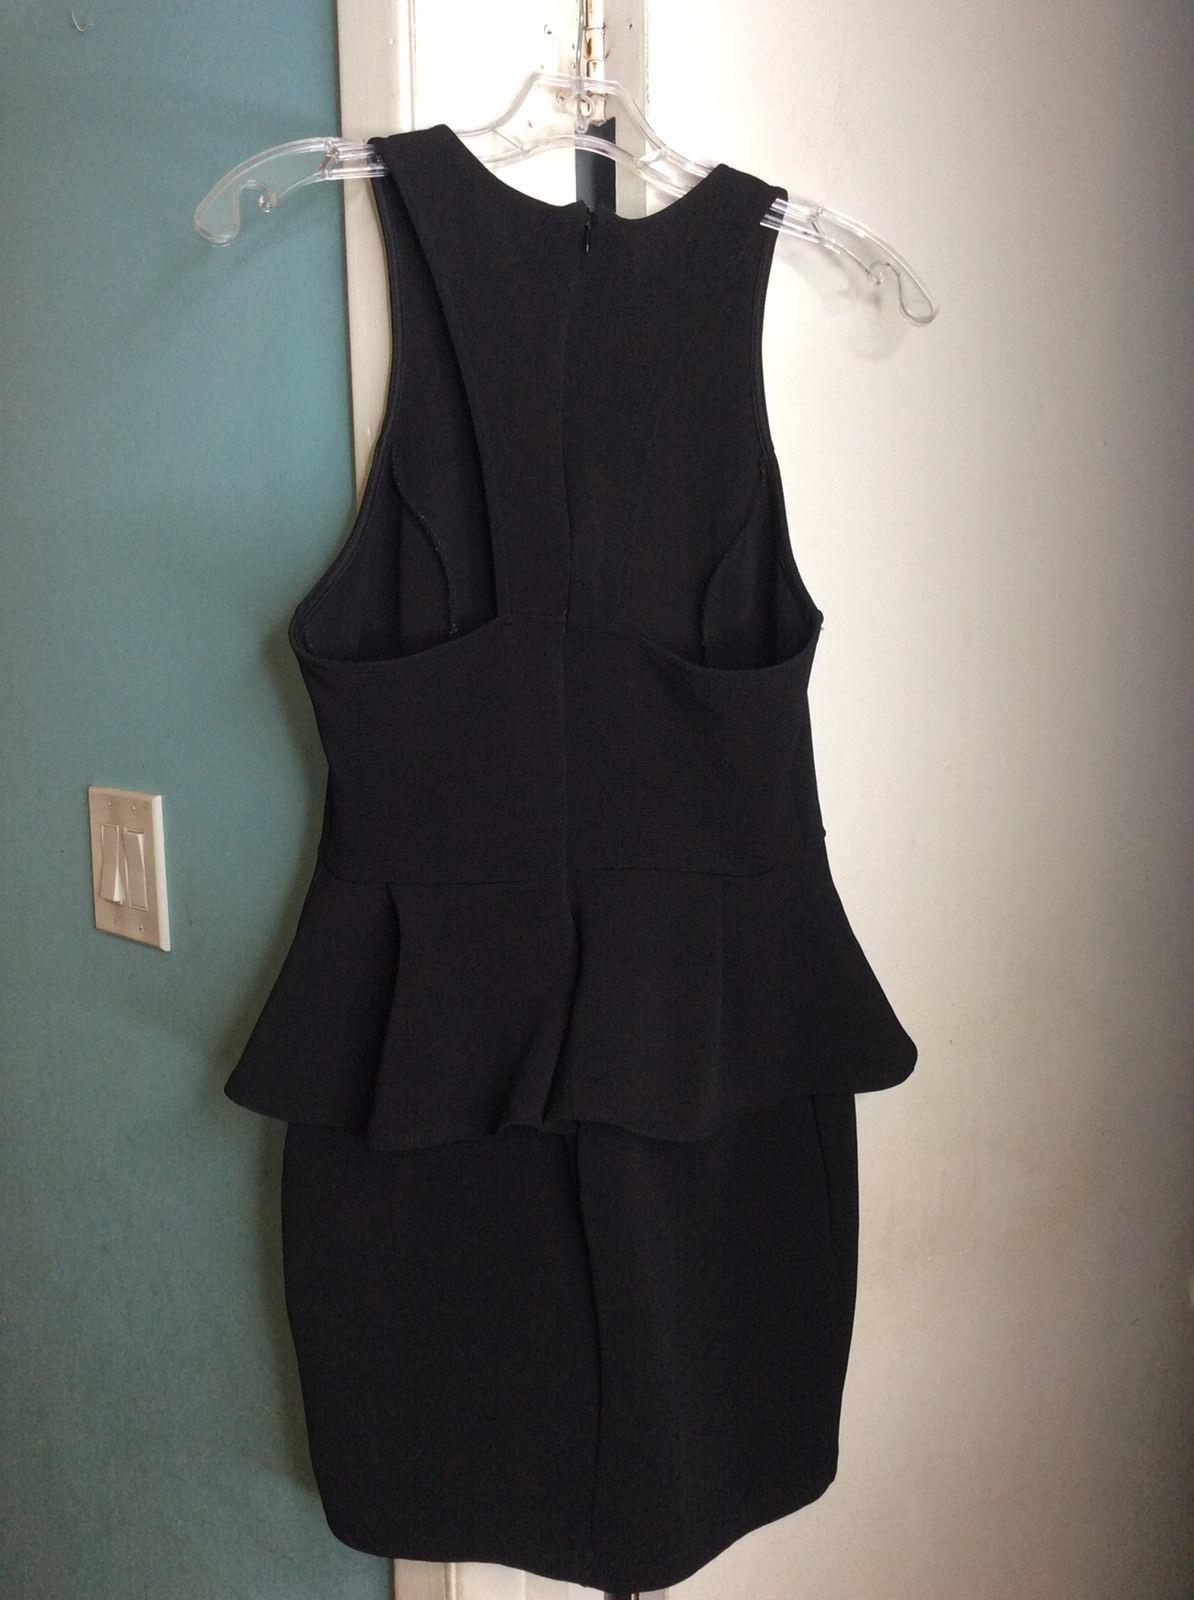 LUSH Juniors Black Zip Racerback Sleeveless Peplum Stretch Bodycon Dress Sz L